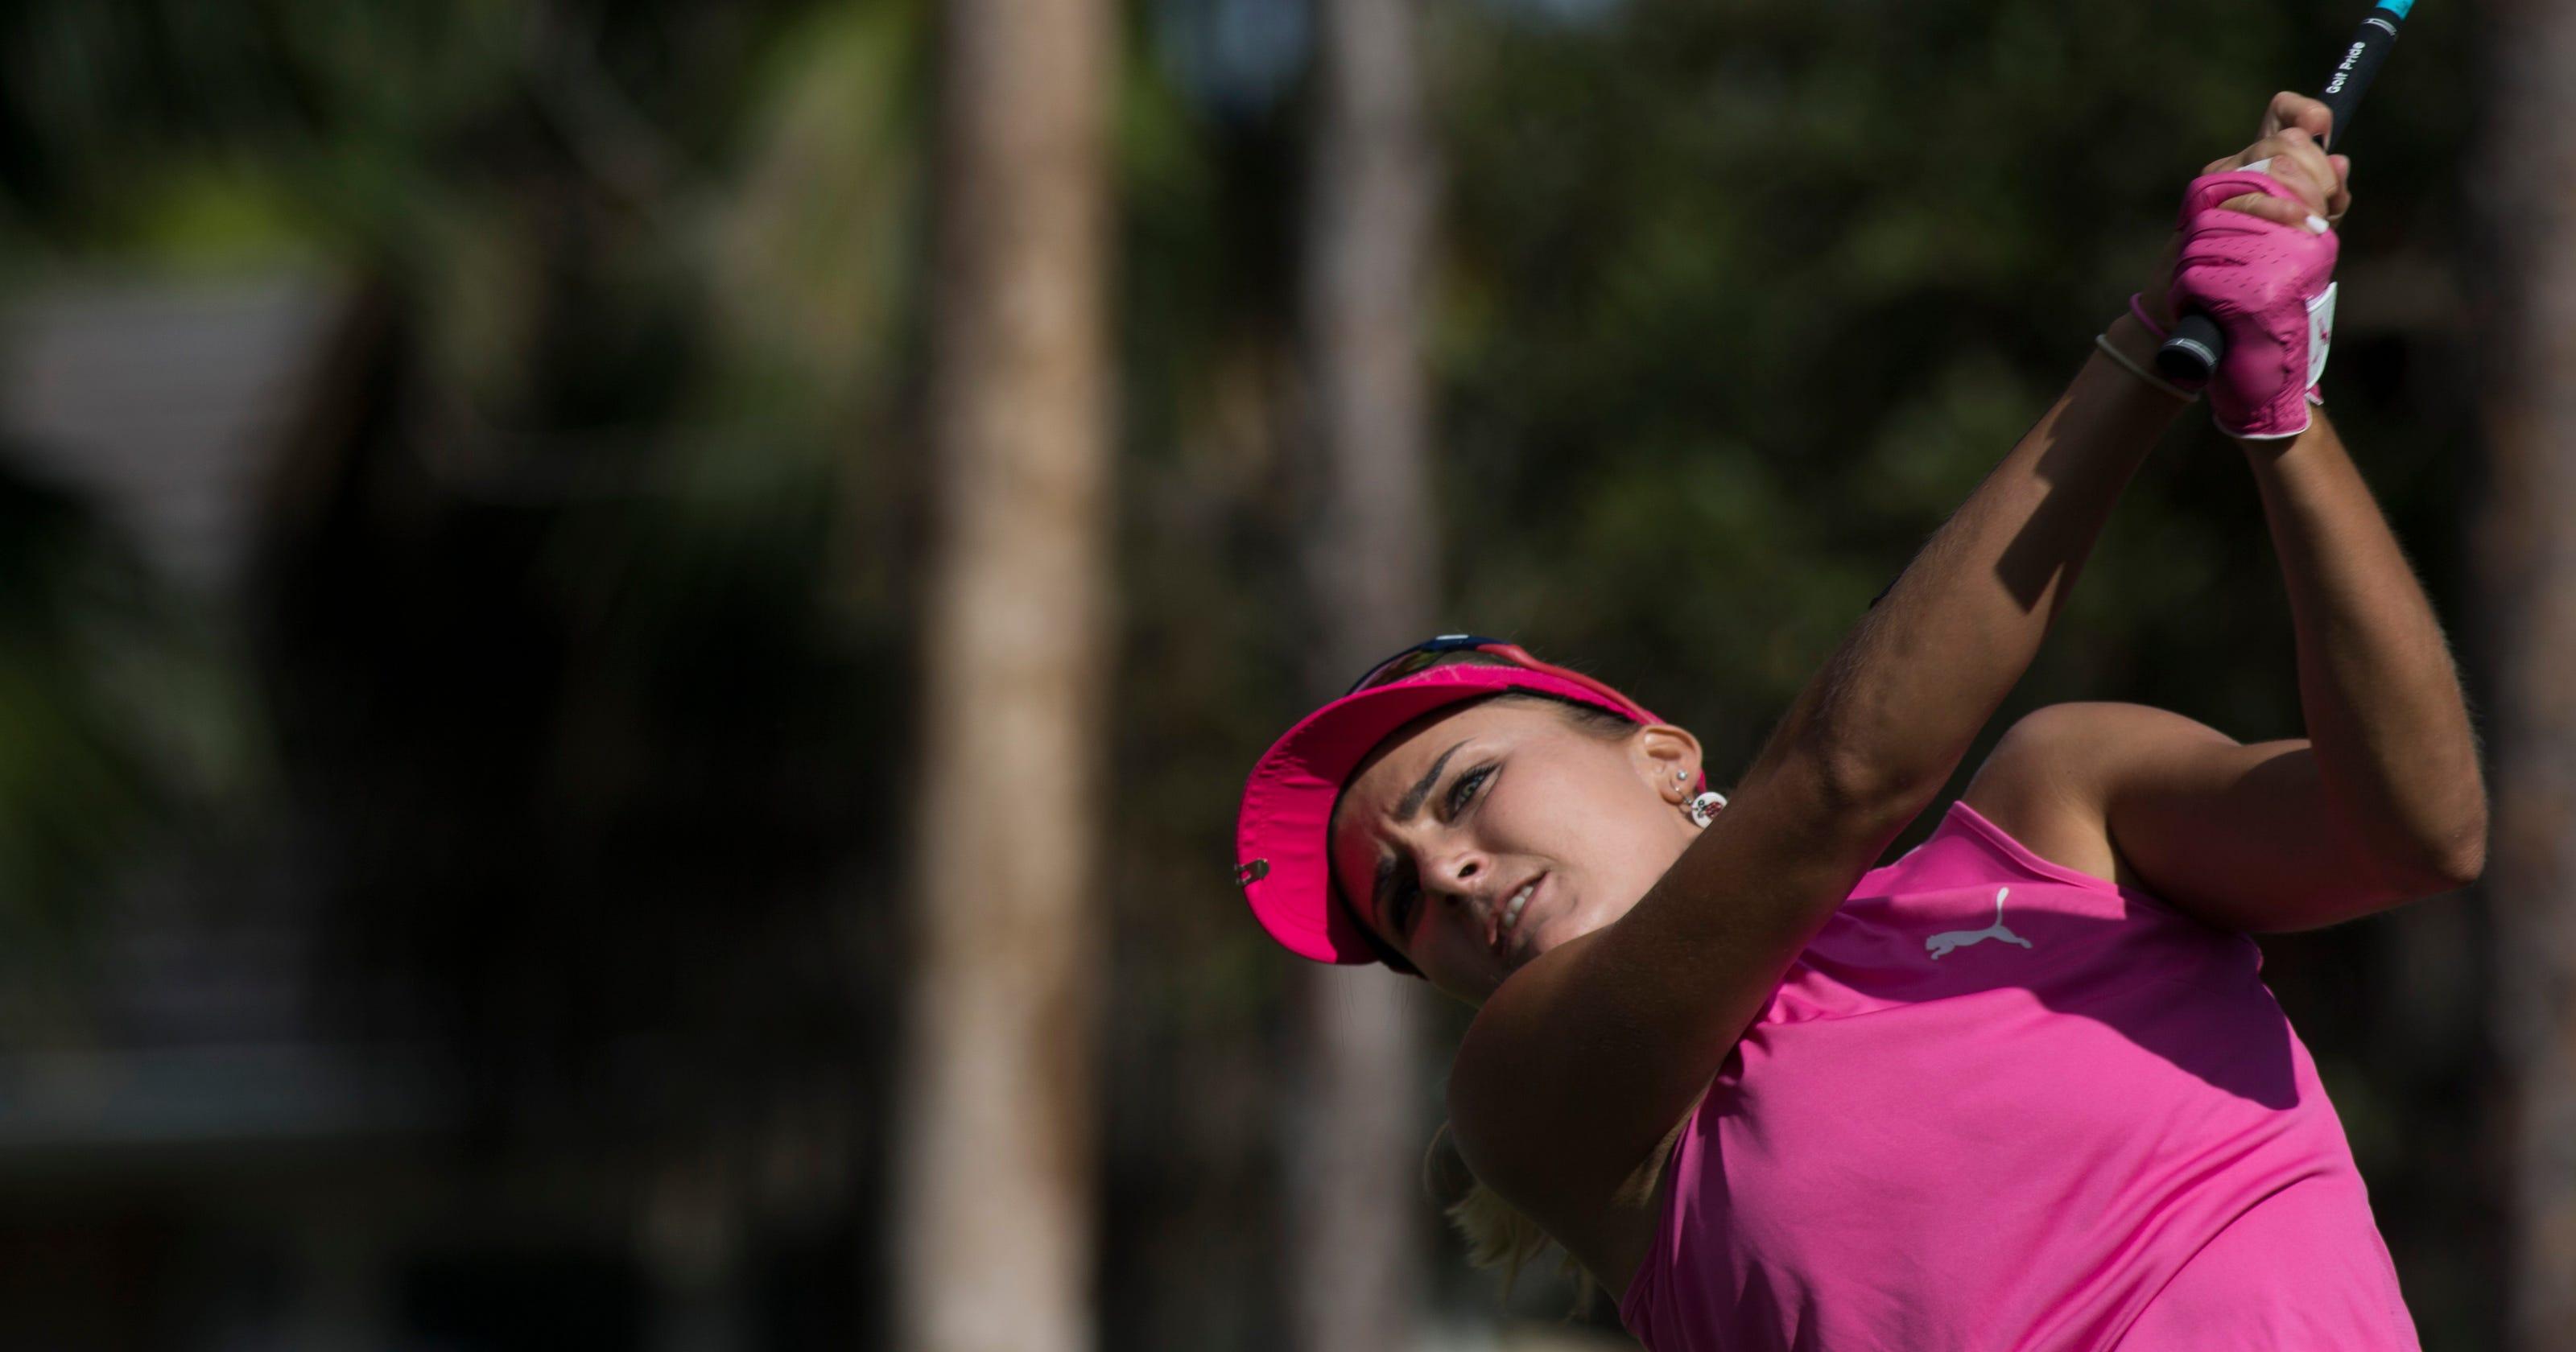 Golf: Lexi Thompson-Tony Finau highlights QBE Shootout